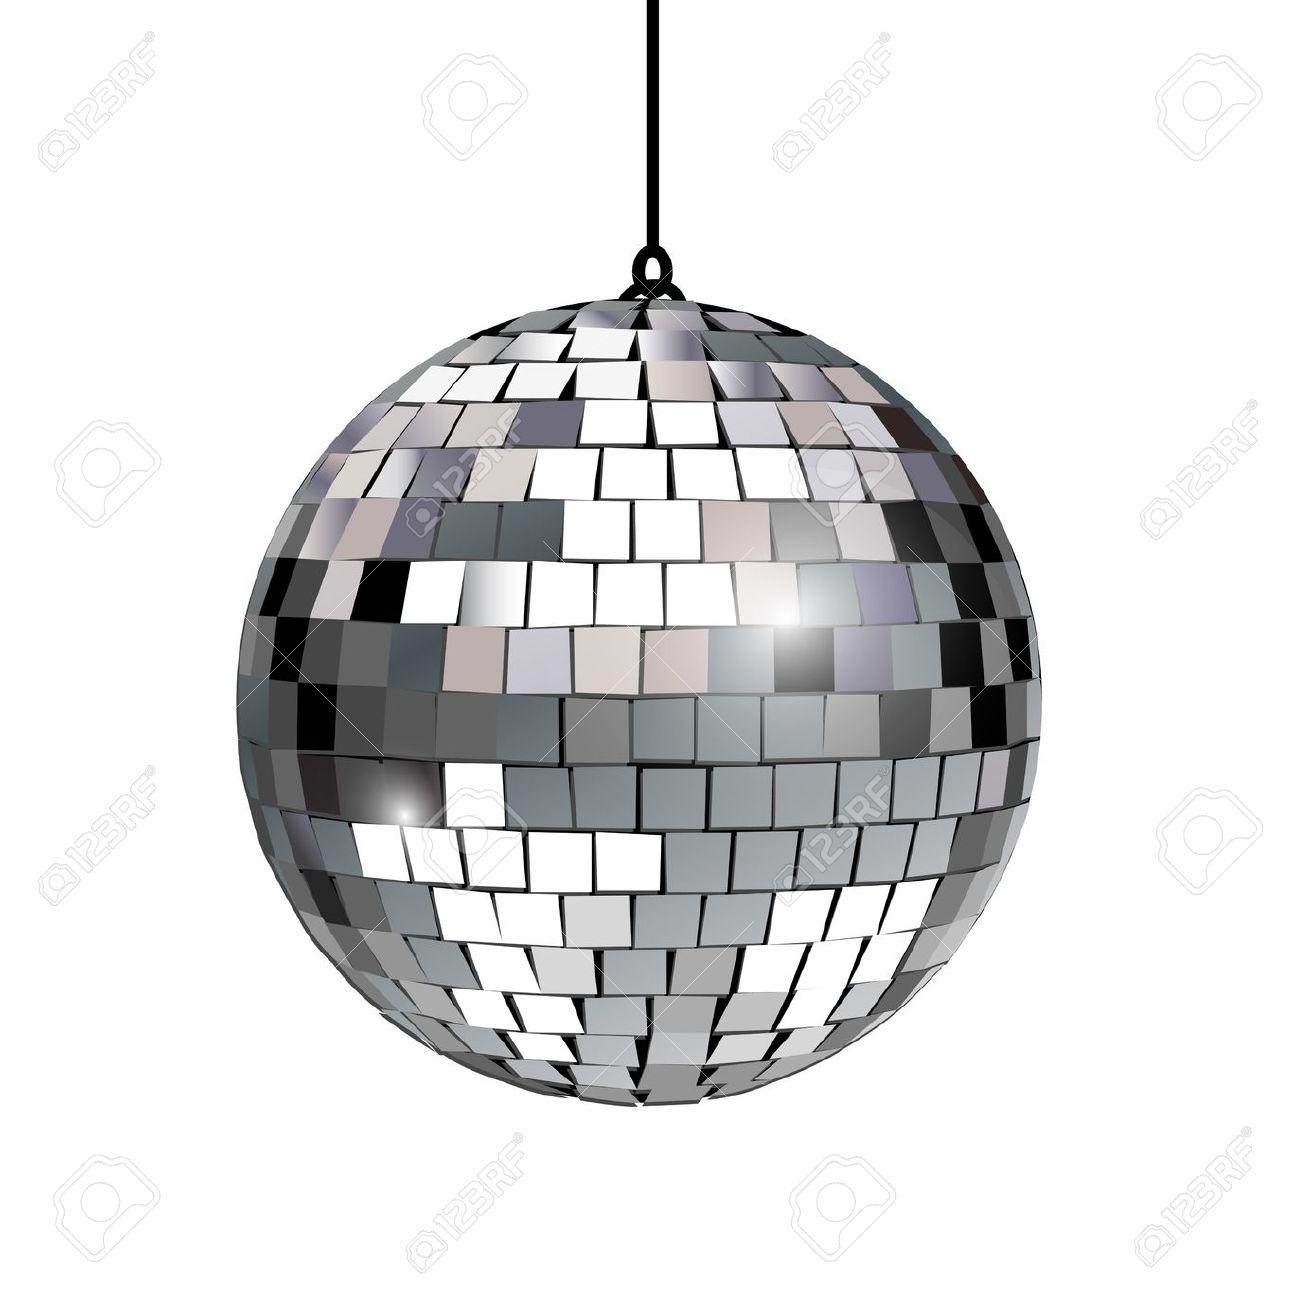 disco ball isolated: disco .